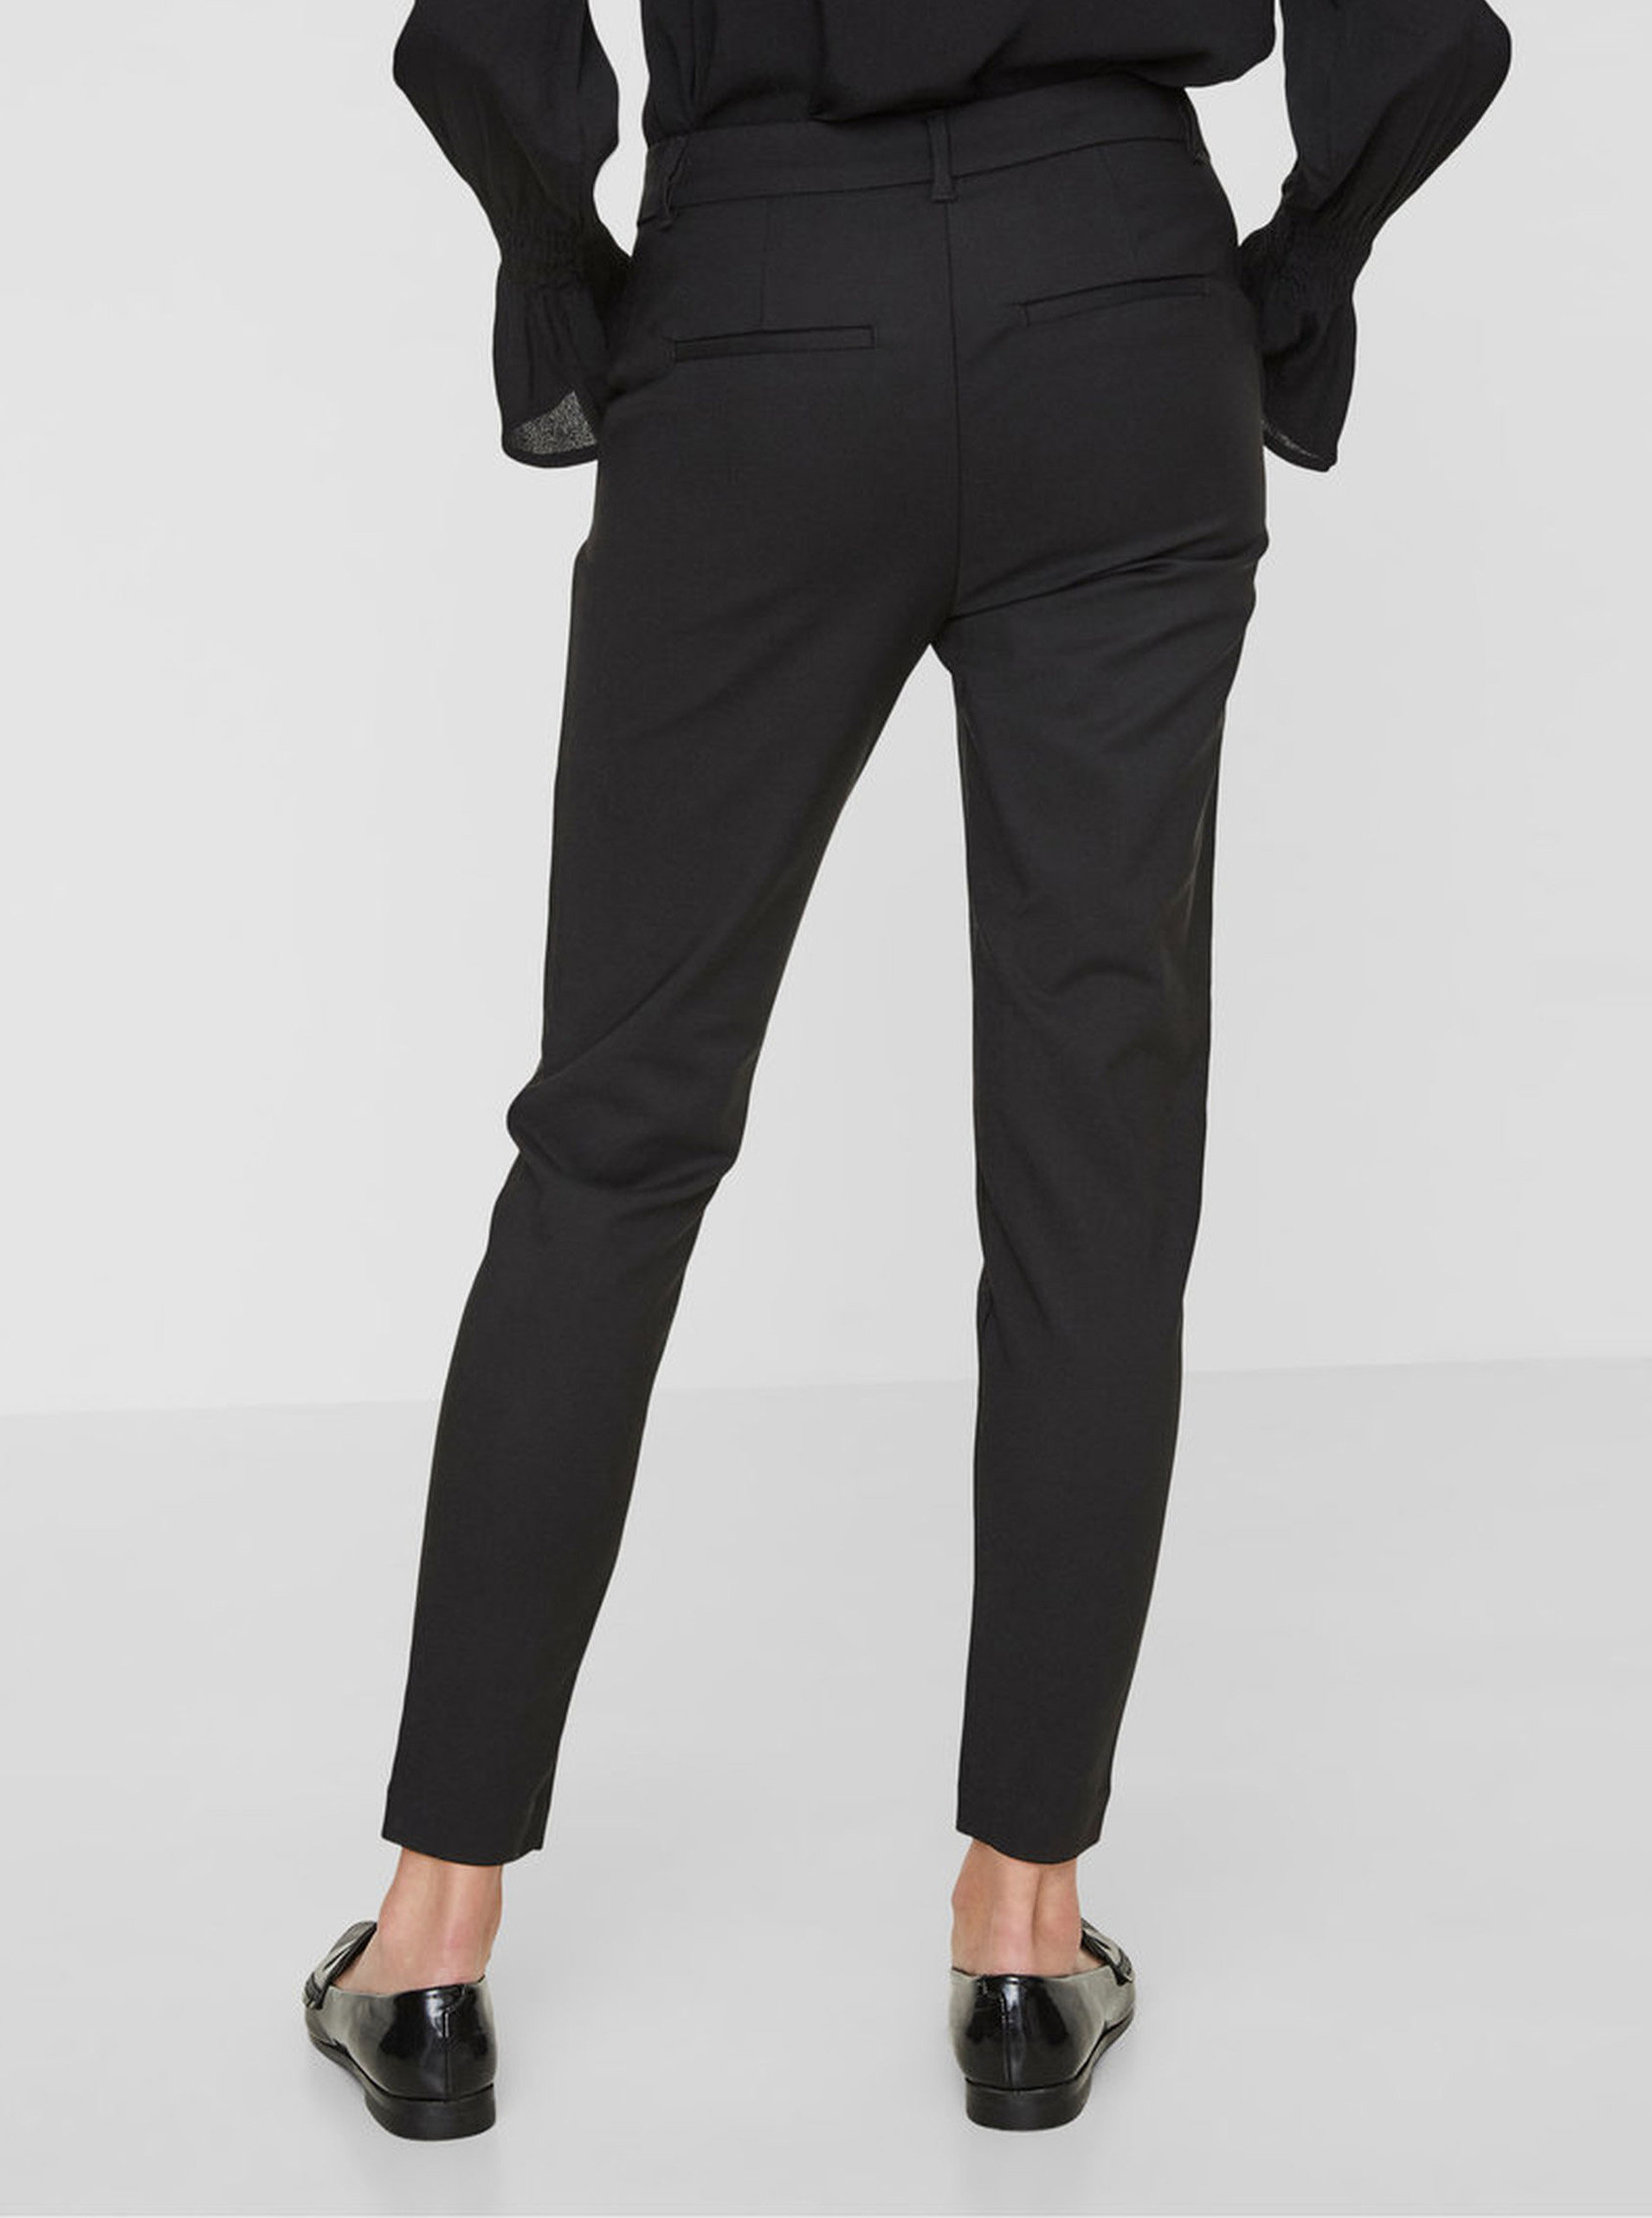 Černé kalhoty s kapsami VERO MODA Victoria ... d1b5625d5a